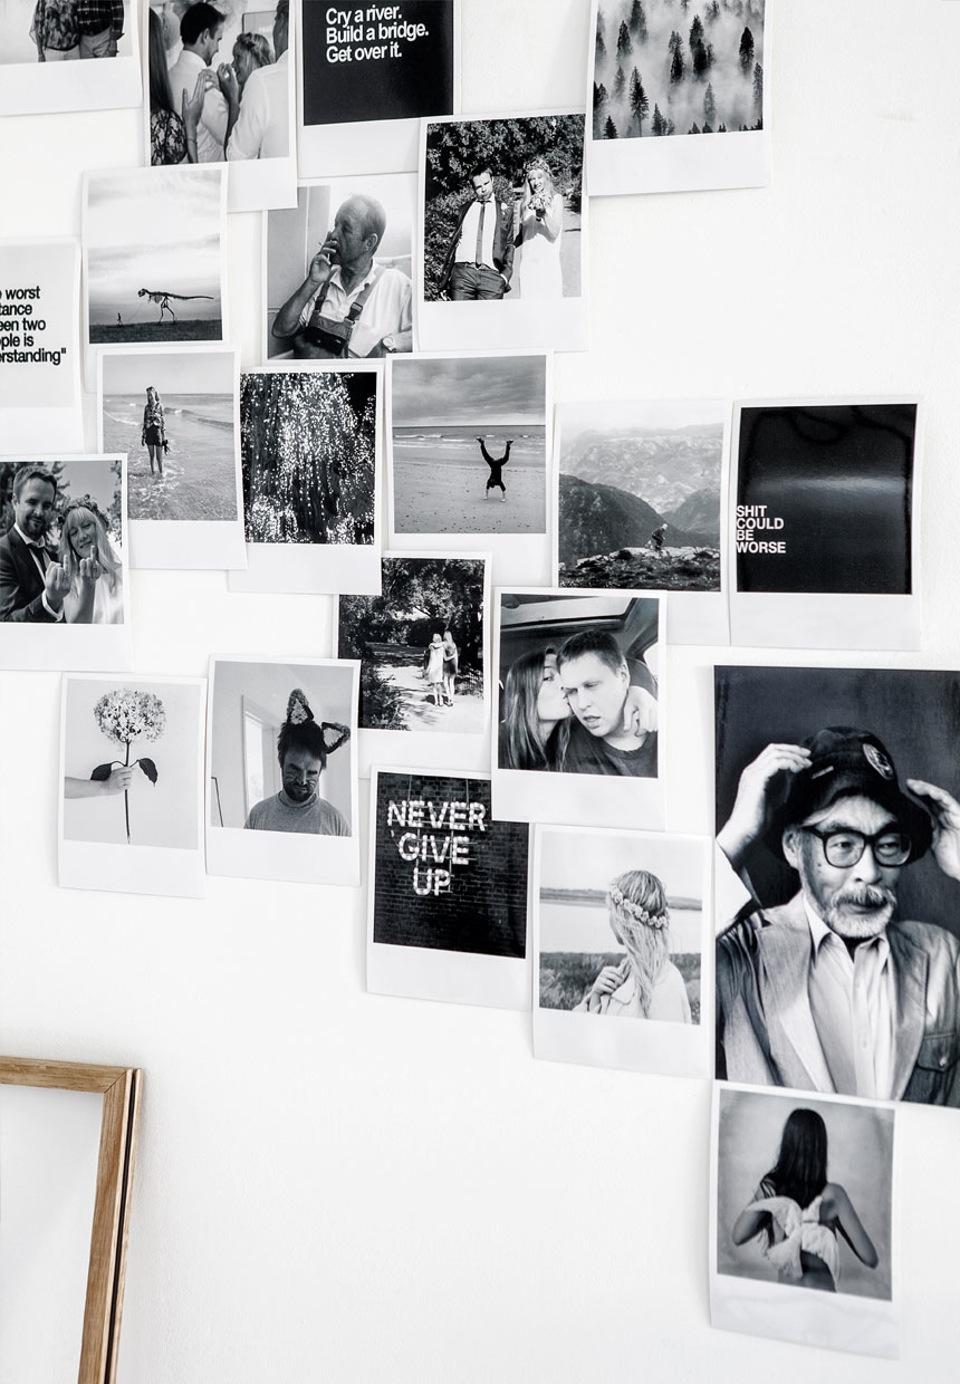 polaroid-billeder-johanne-nygaard-dueholm-lejlighed-aalborg-zx9fjtmdqxg_ulplsbfyxq